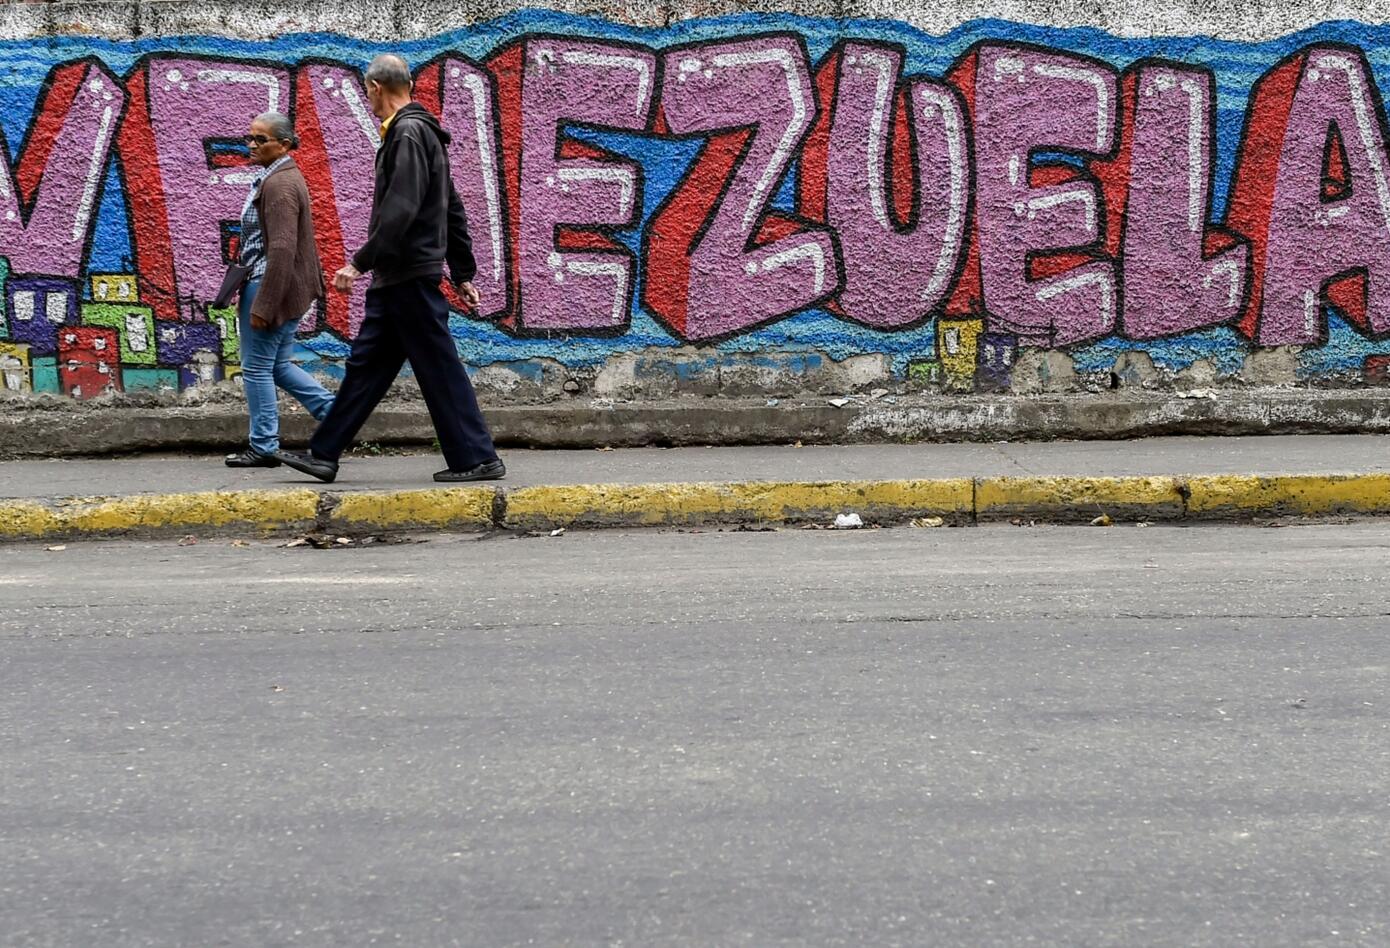 Venezuela afronta una profunda crisis institucional luego de que Juan Guaidó se proclamara presidente interino.